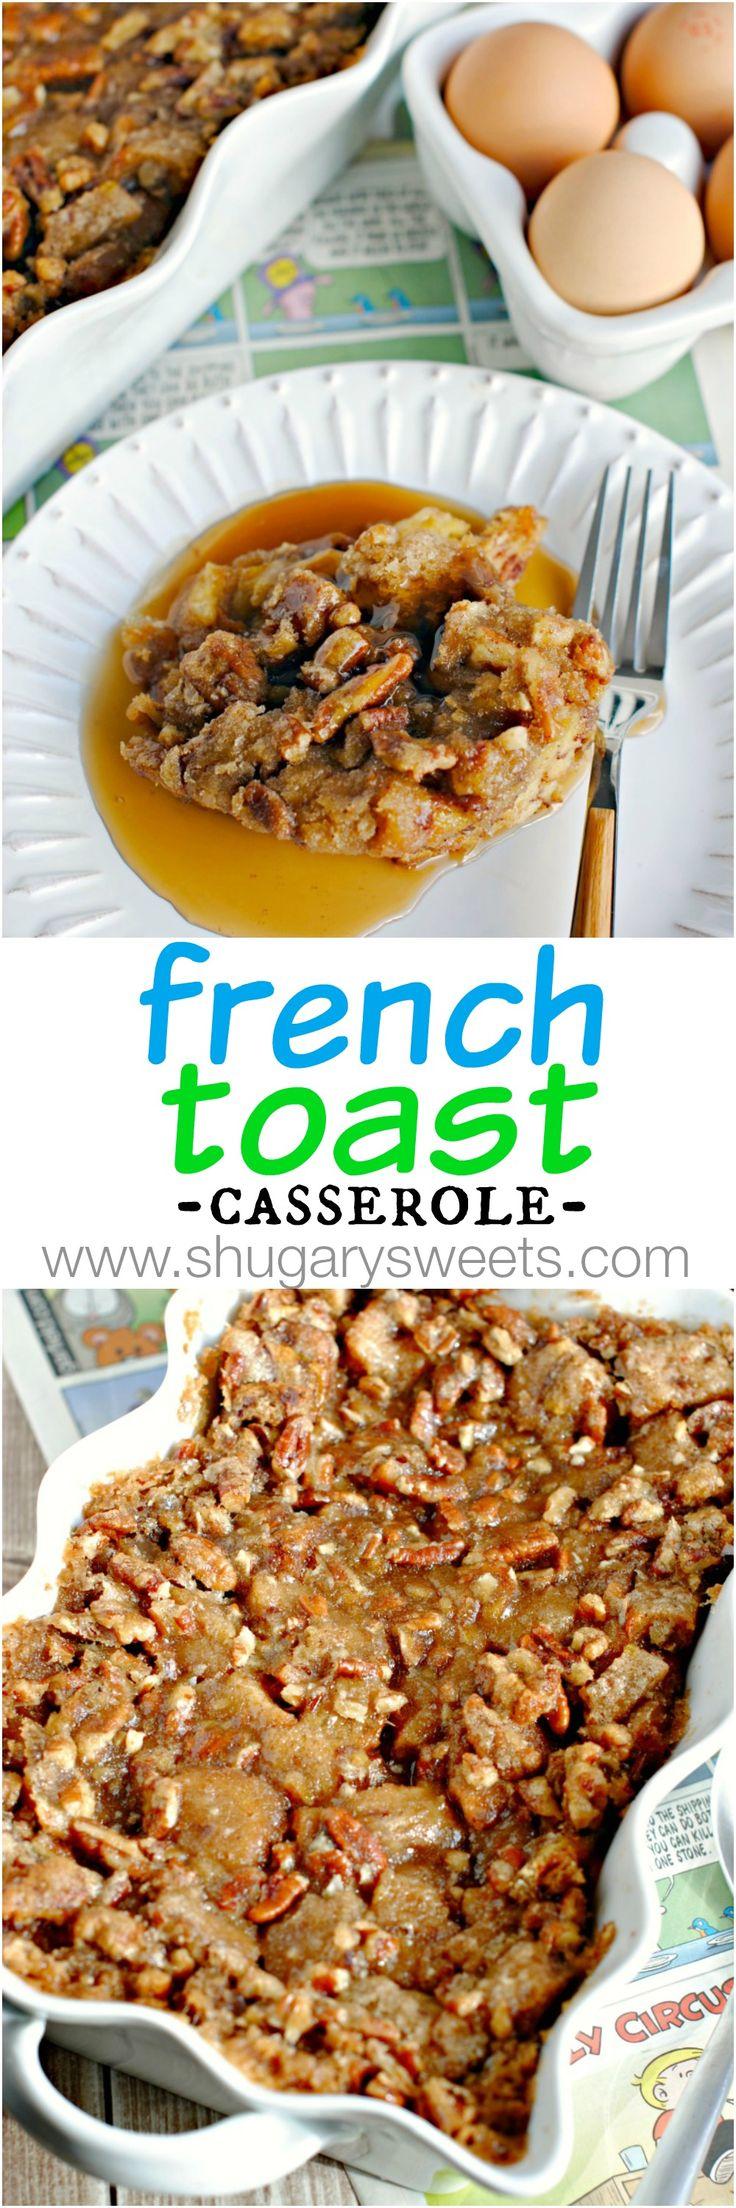 Overnight French Toast Casserole - Shugary Sweets